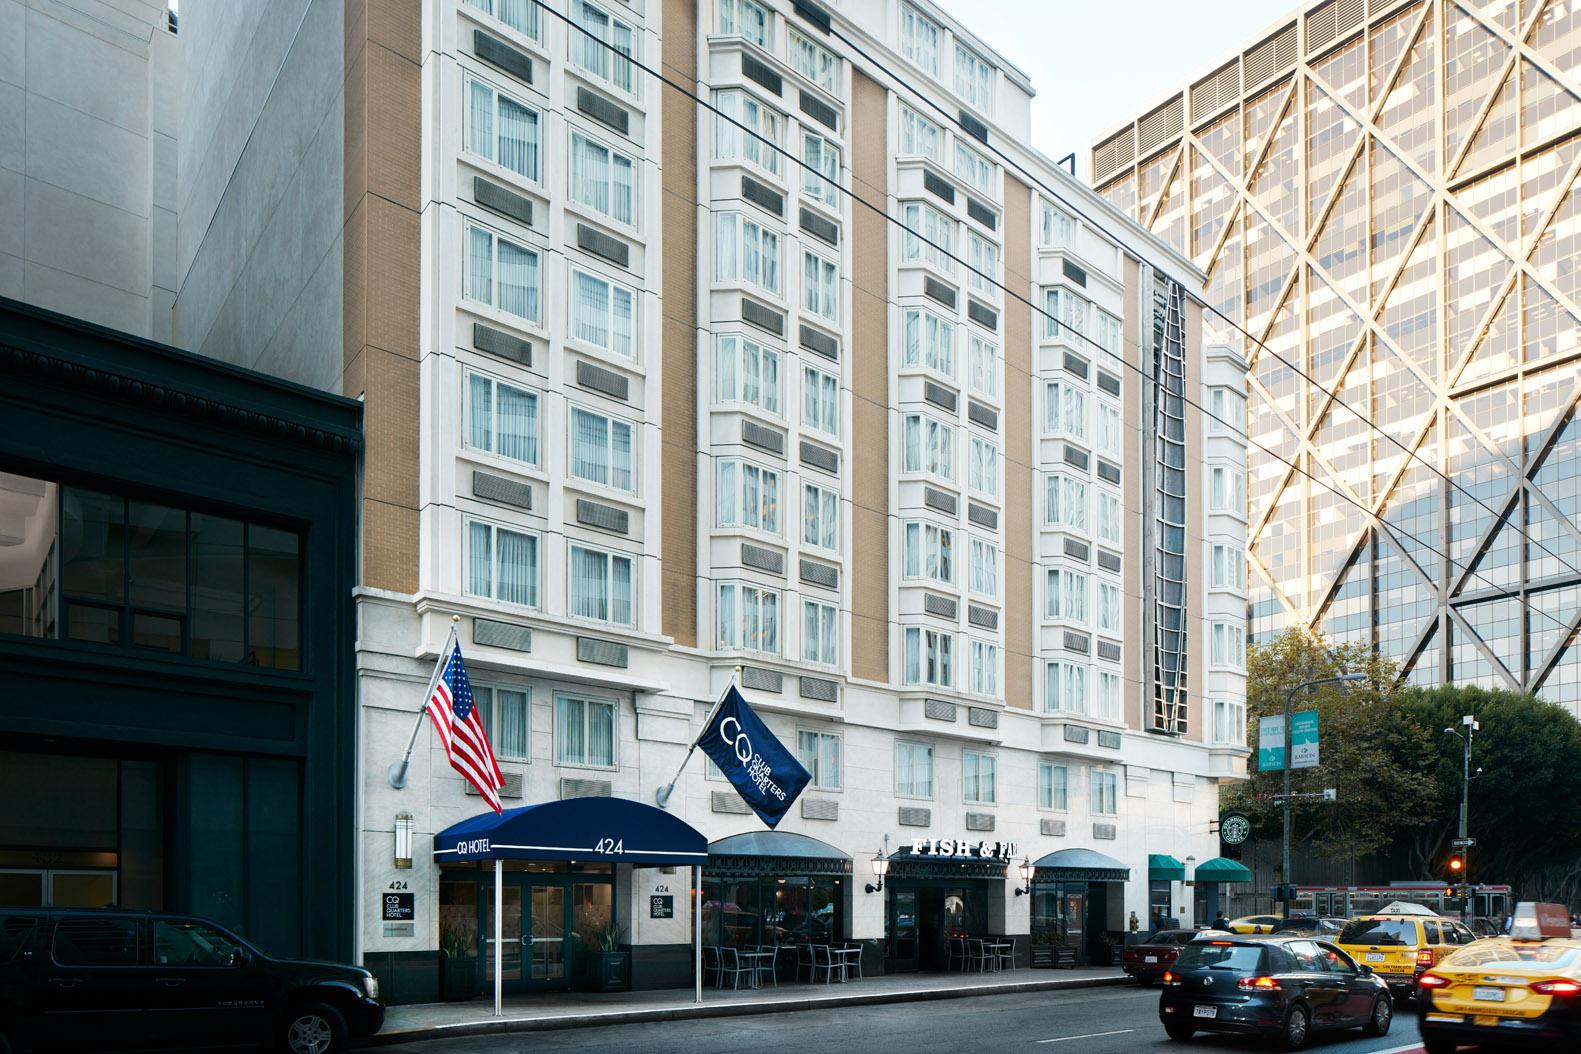 Club Quarters Hotel in San Francisco A Business Travelers Hotel